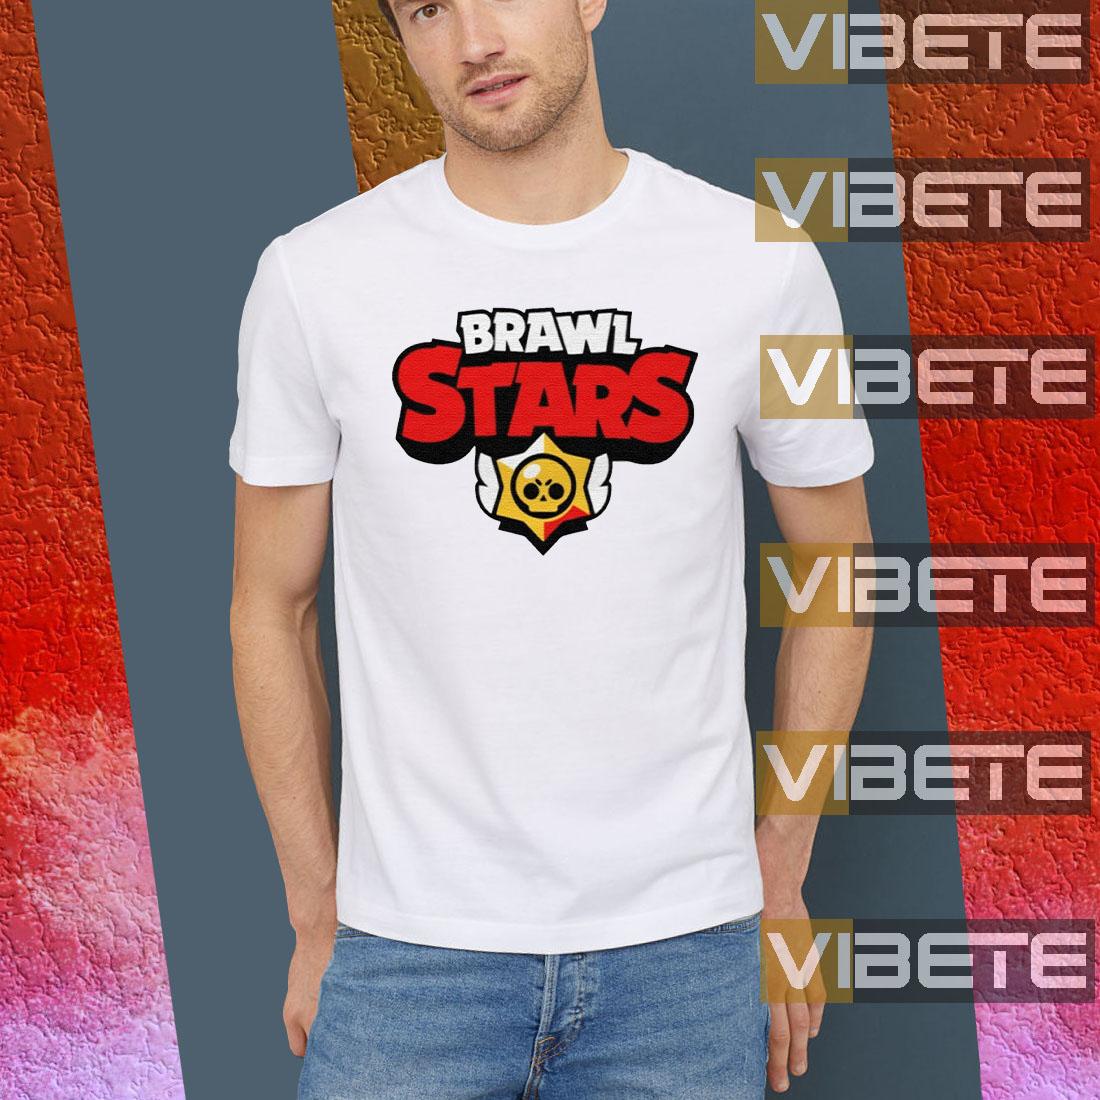 brawl stars shirt